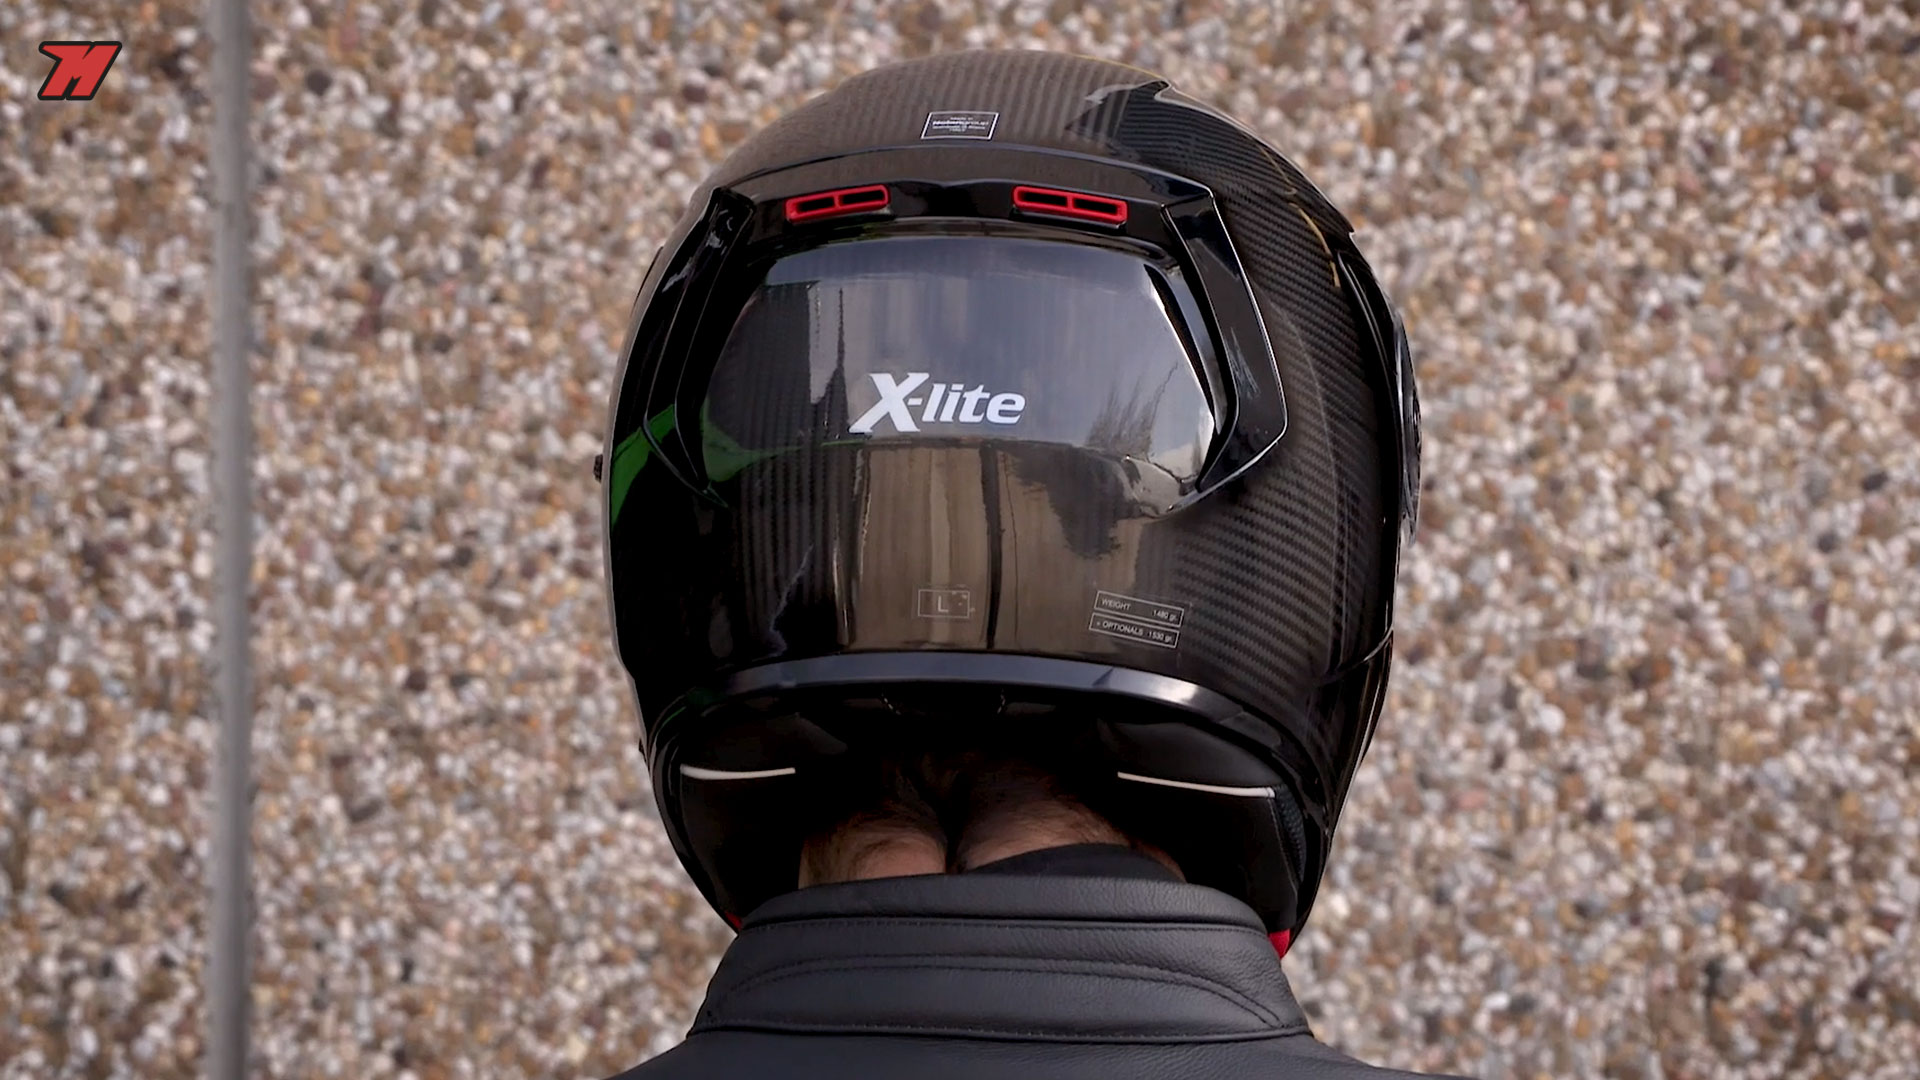 x lite x 903 ultra carbon the new high end nolan full face helmet motocard. Black Bedroom Furniture Sets. Home Design Ideas